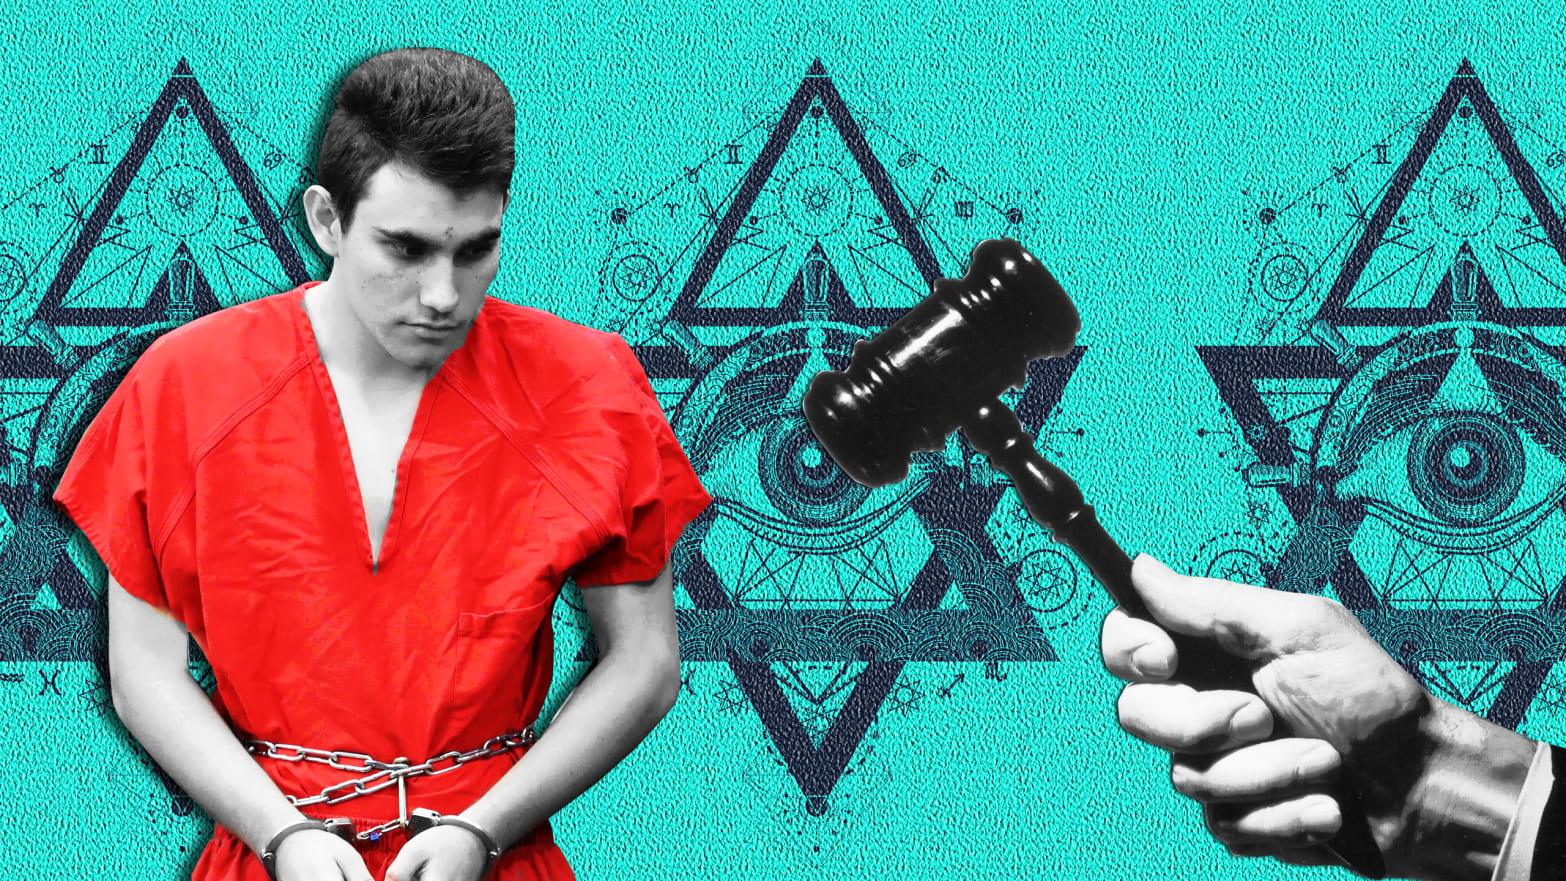 Court Reviews Conspiracy Theories About Nikolas Cruz Being